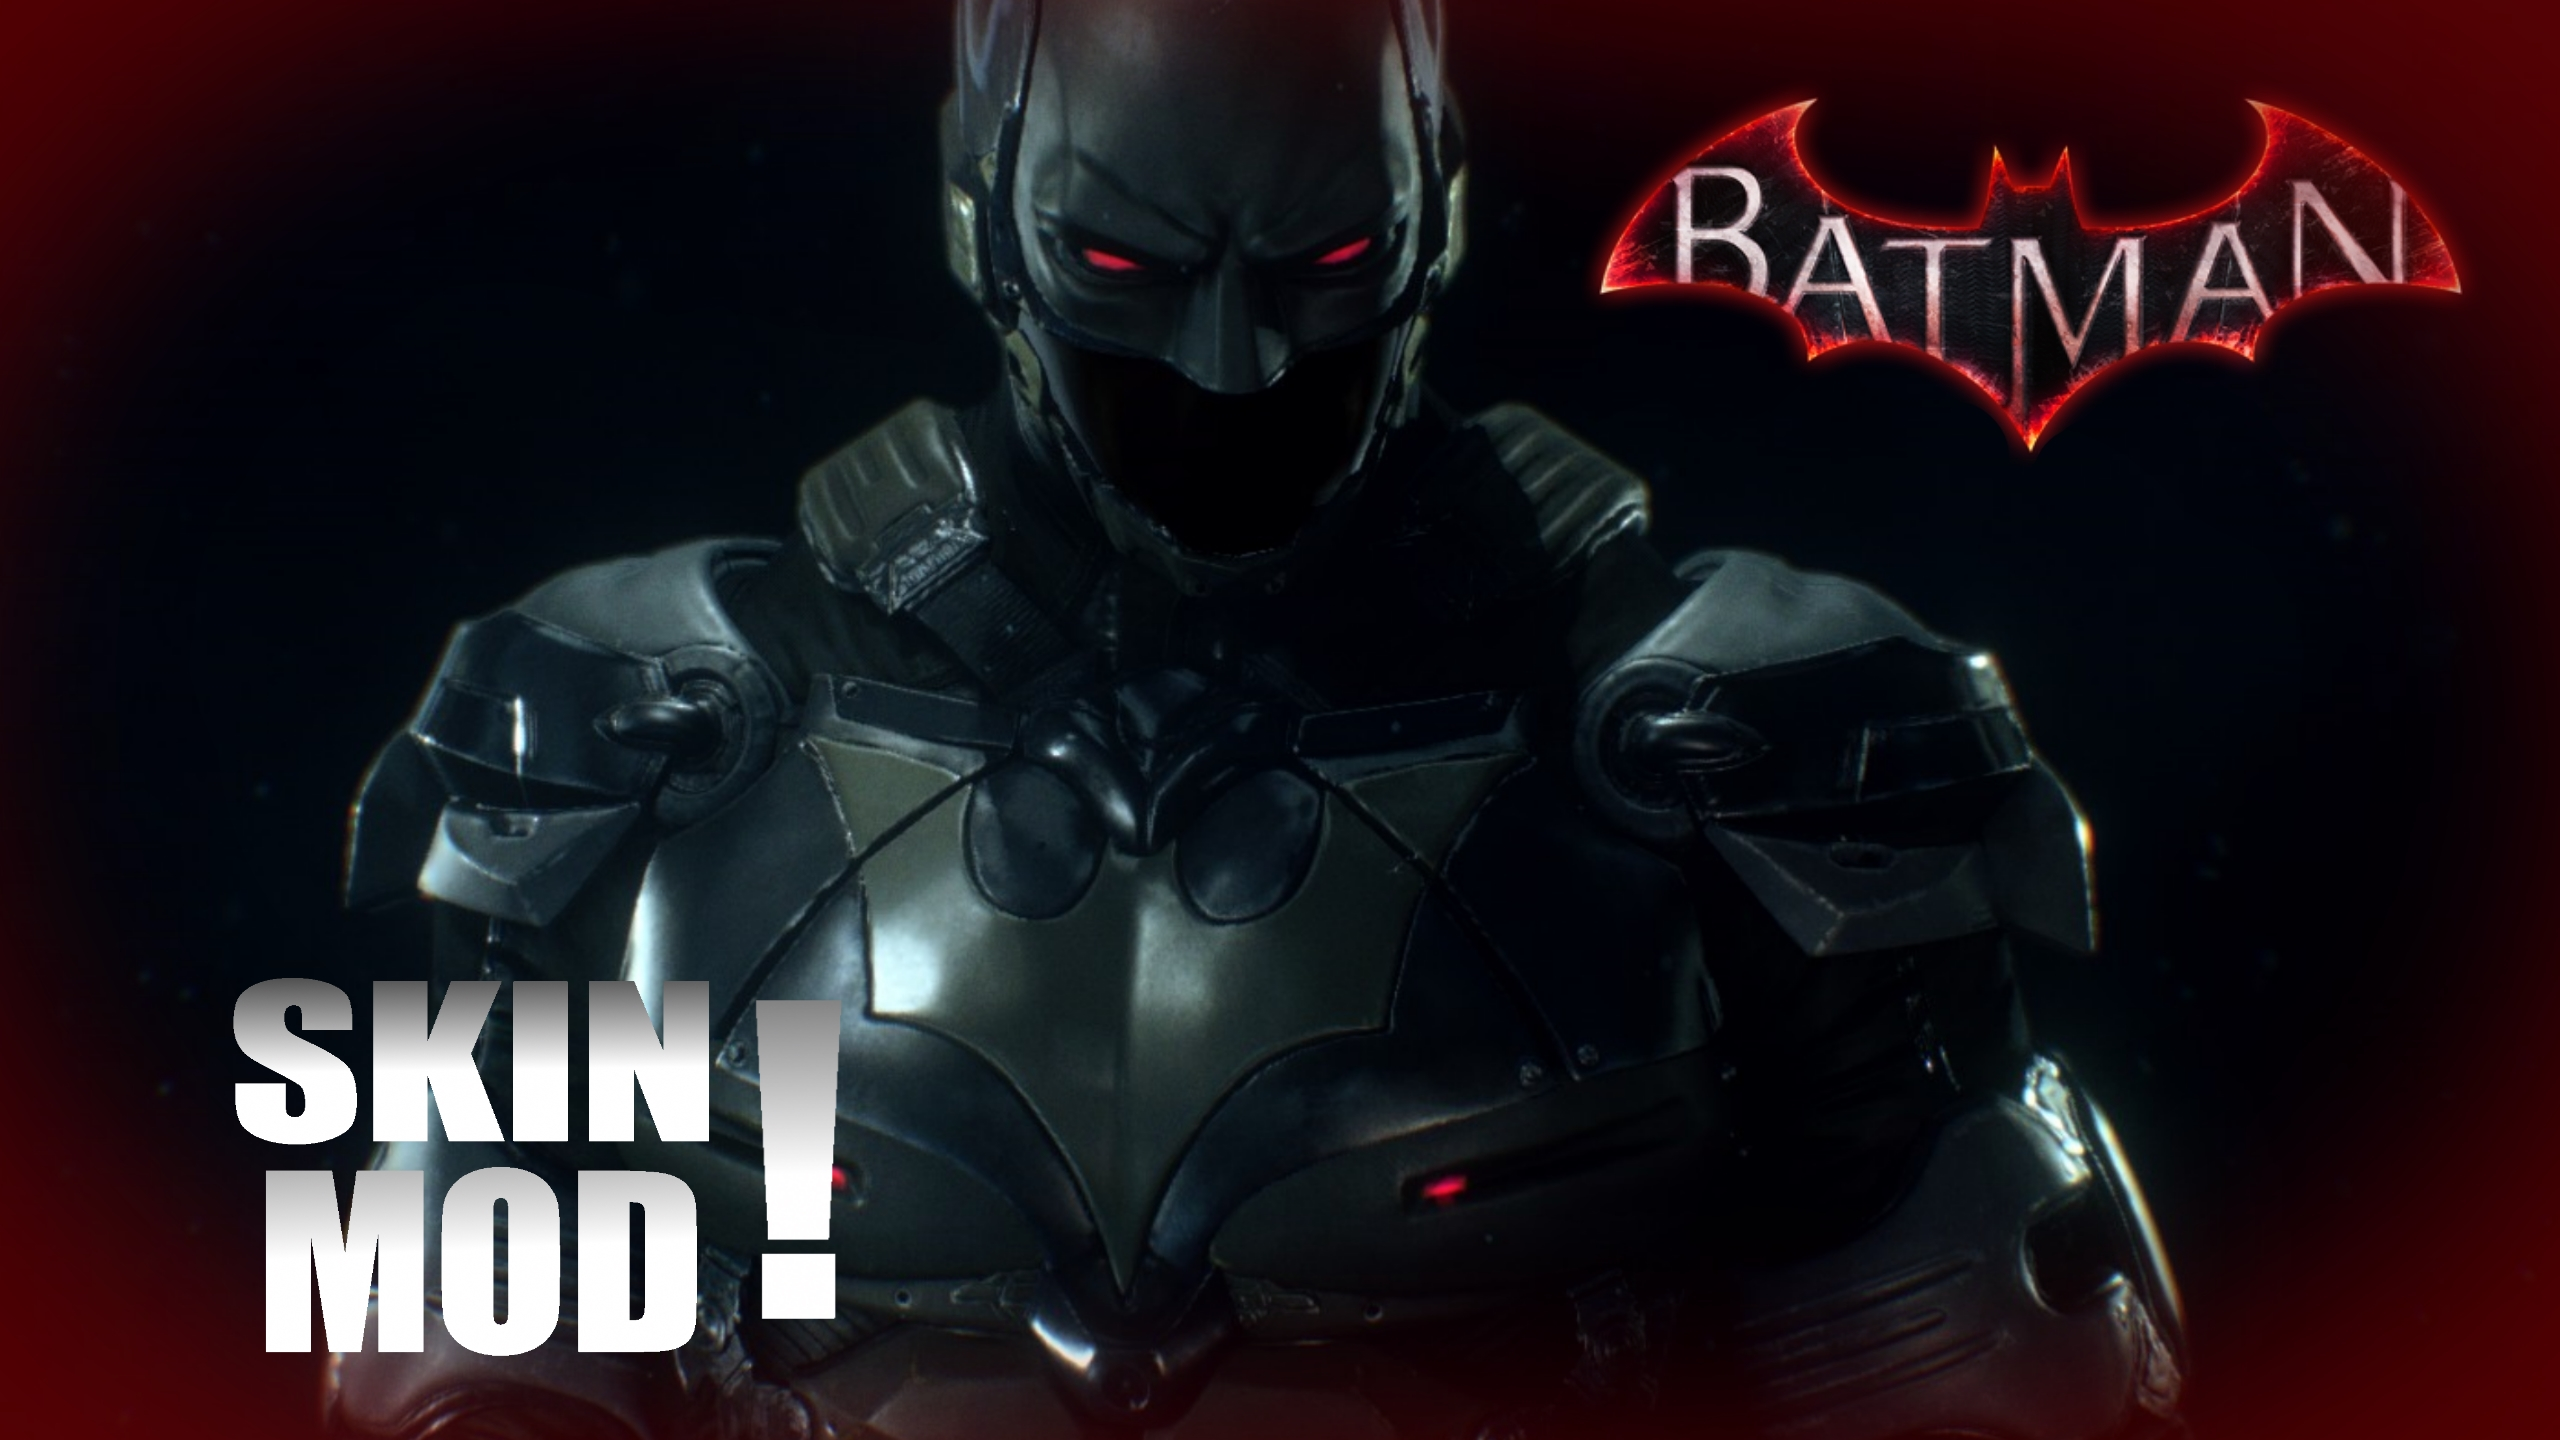 Military Batman skin mod for Batman Arkham Knight